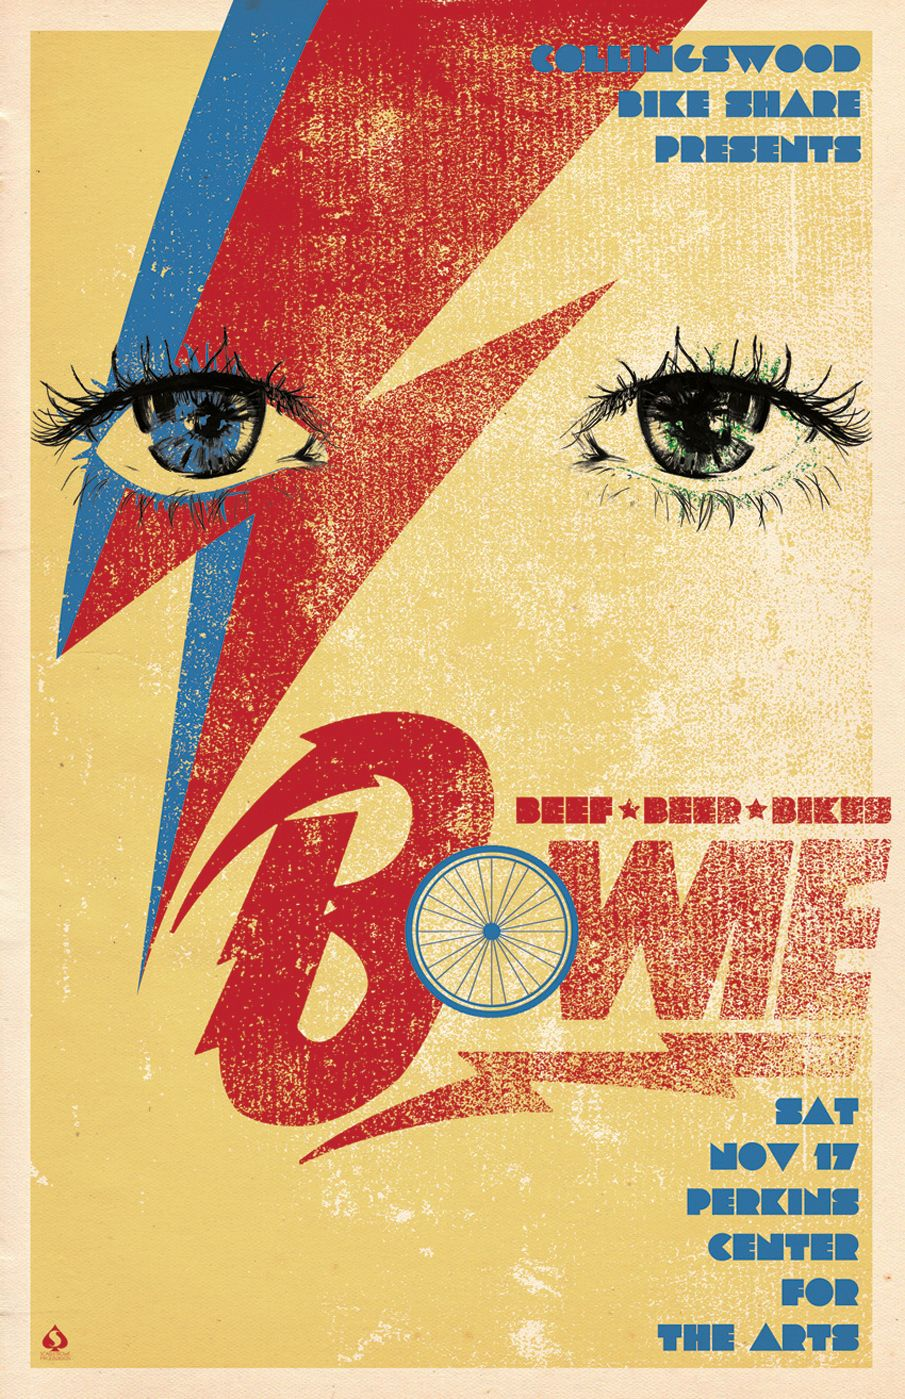 11x17 poster design - Poster Design 11 X 17 Collingswood Bikeshare Benefit Scarlet Rowe Image Design